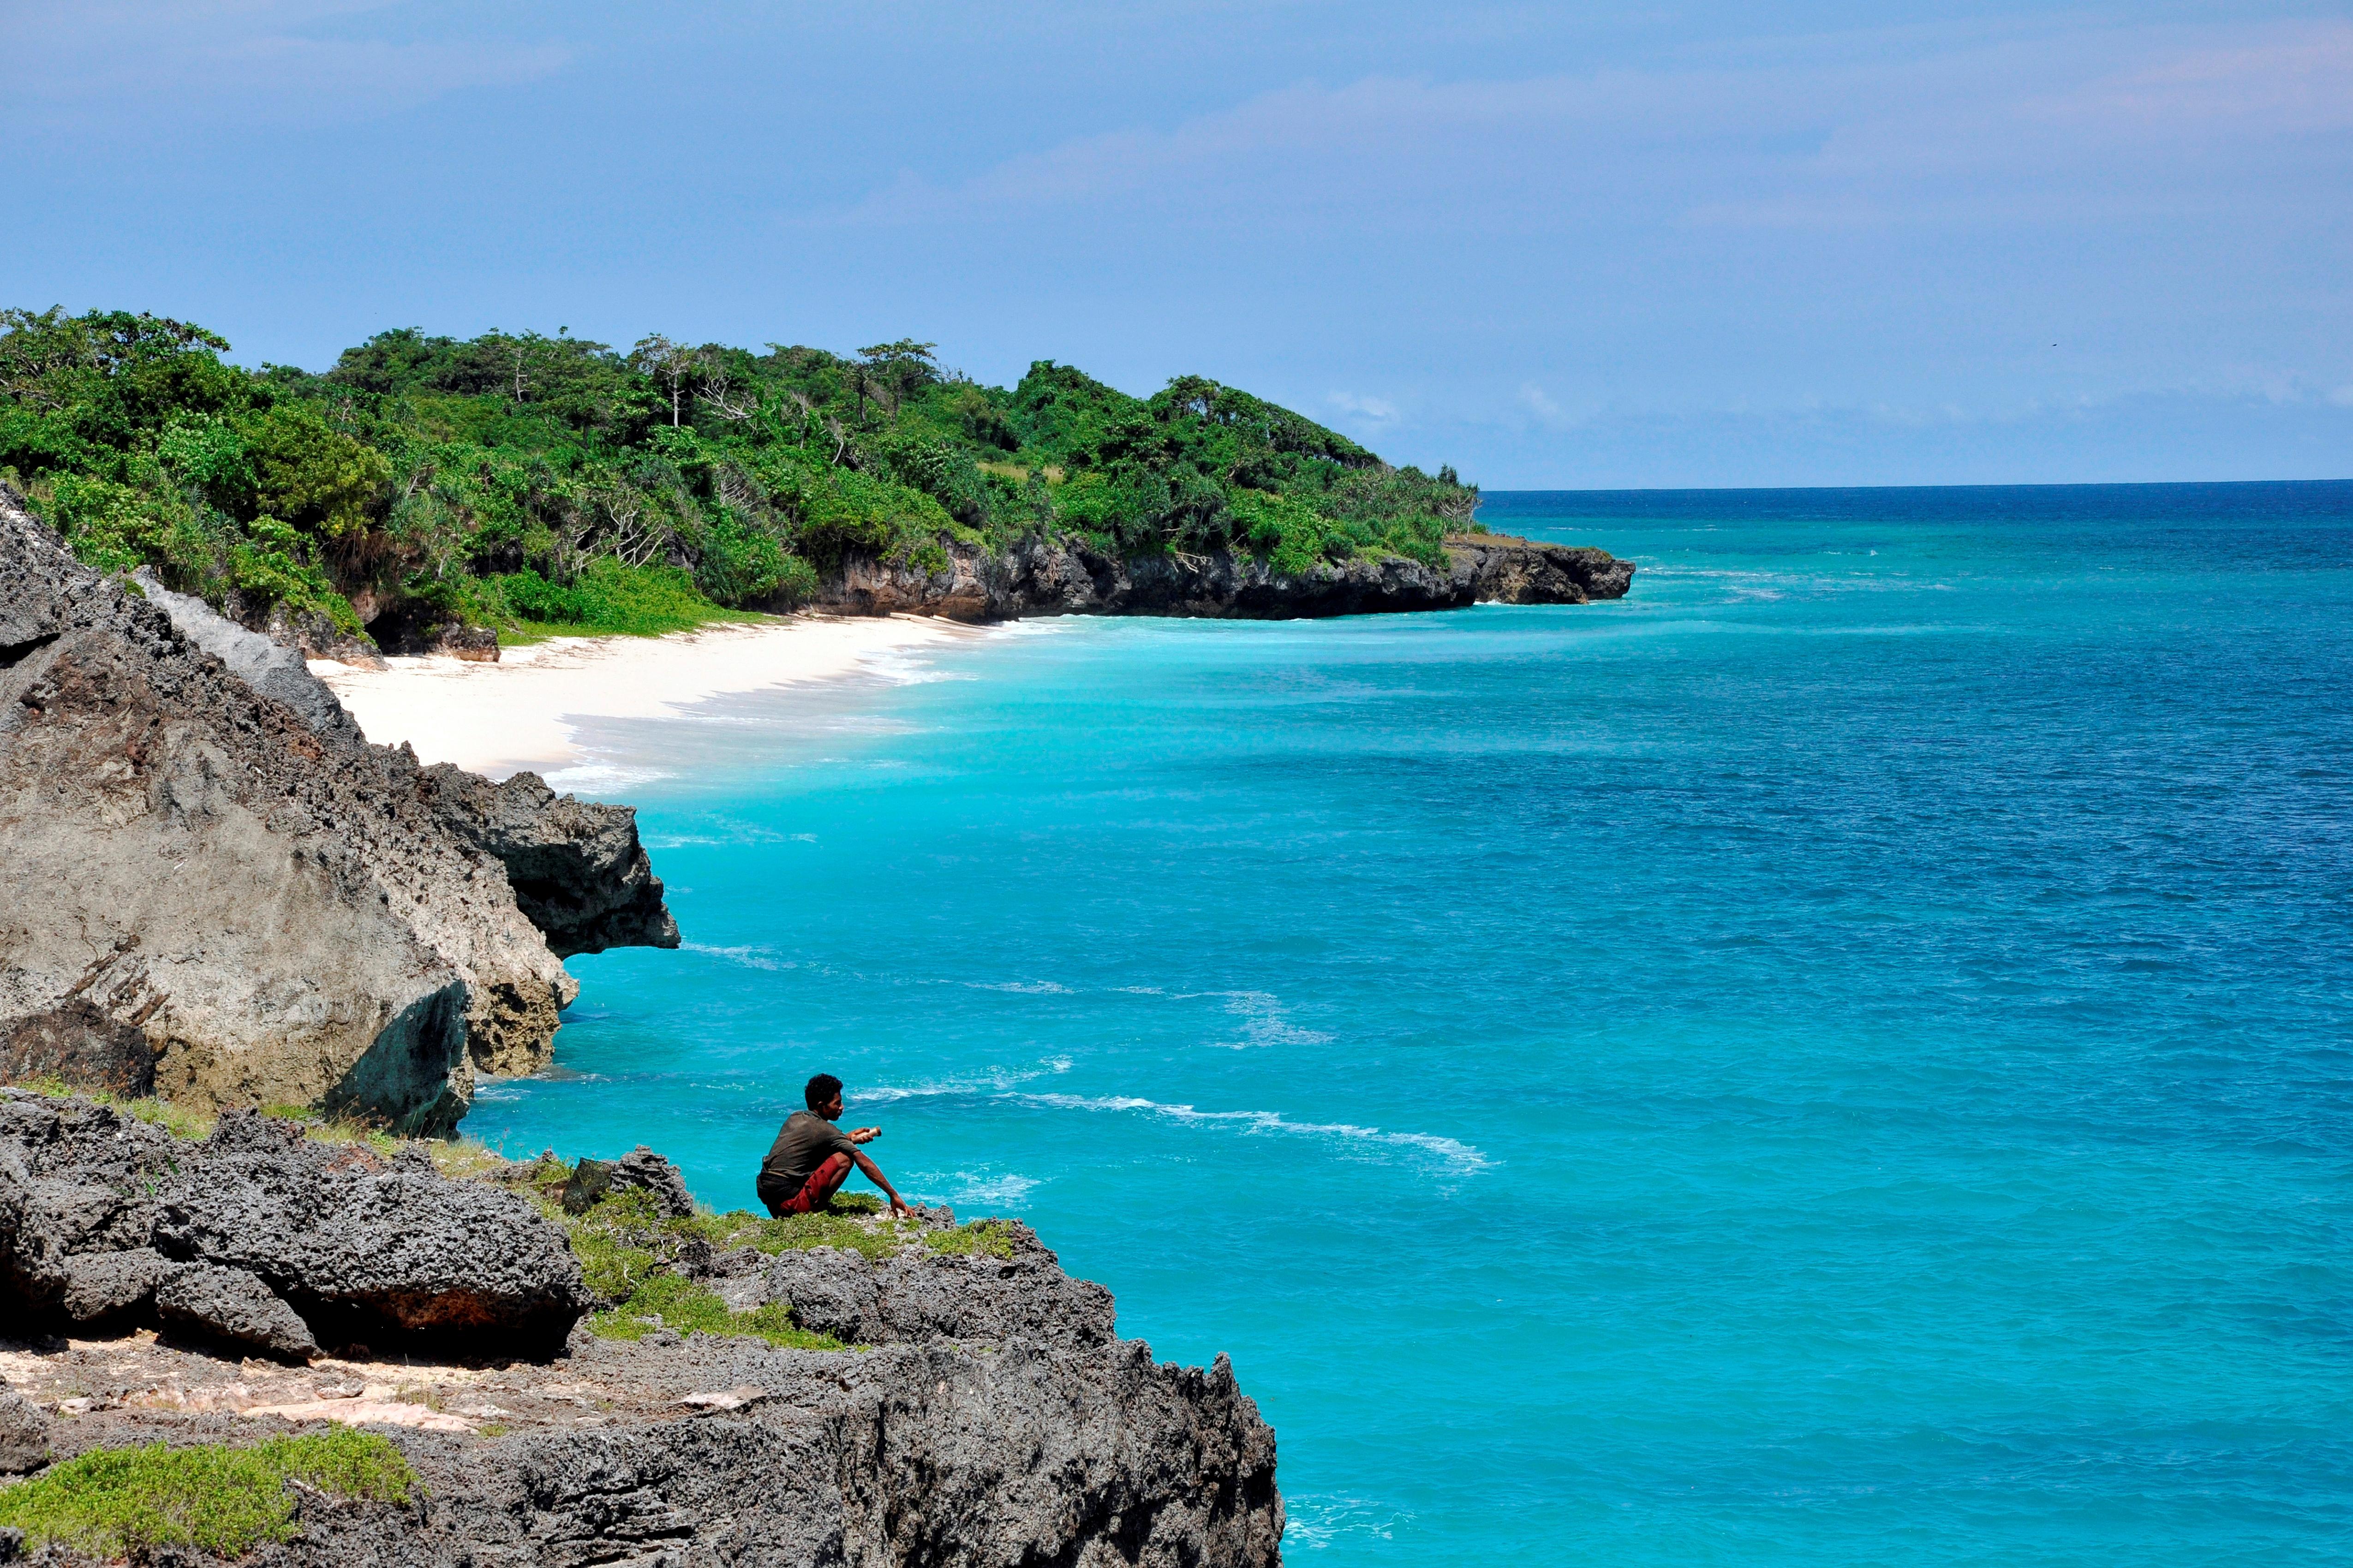 Indonesia. Sumba island. Mandora beach